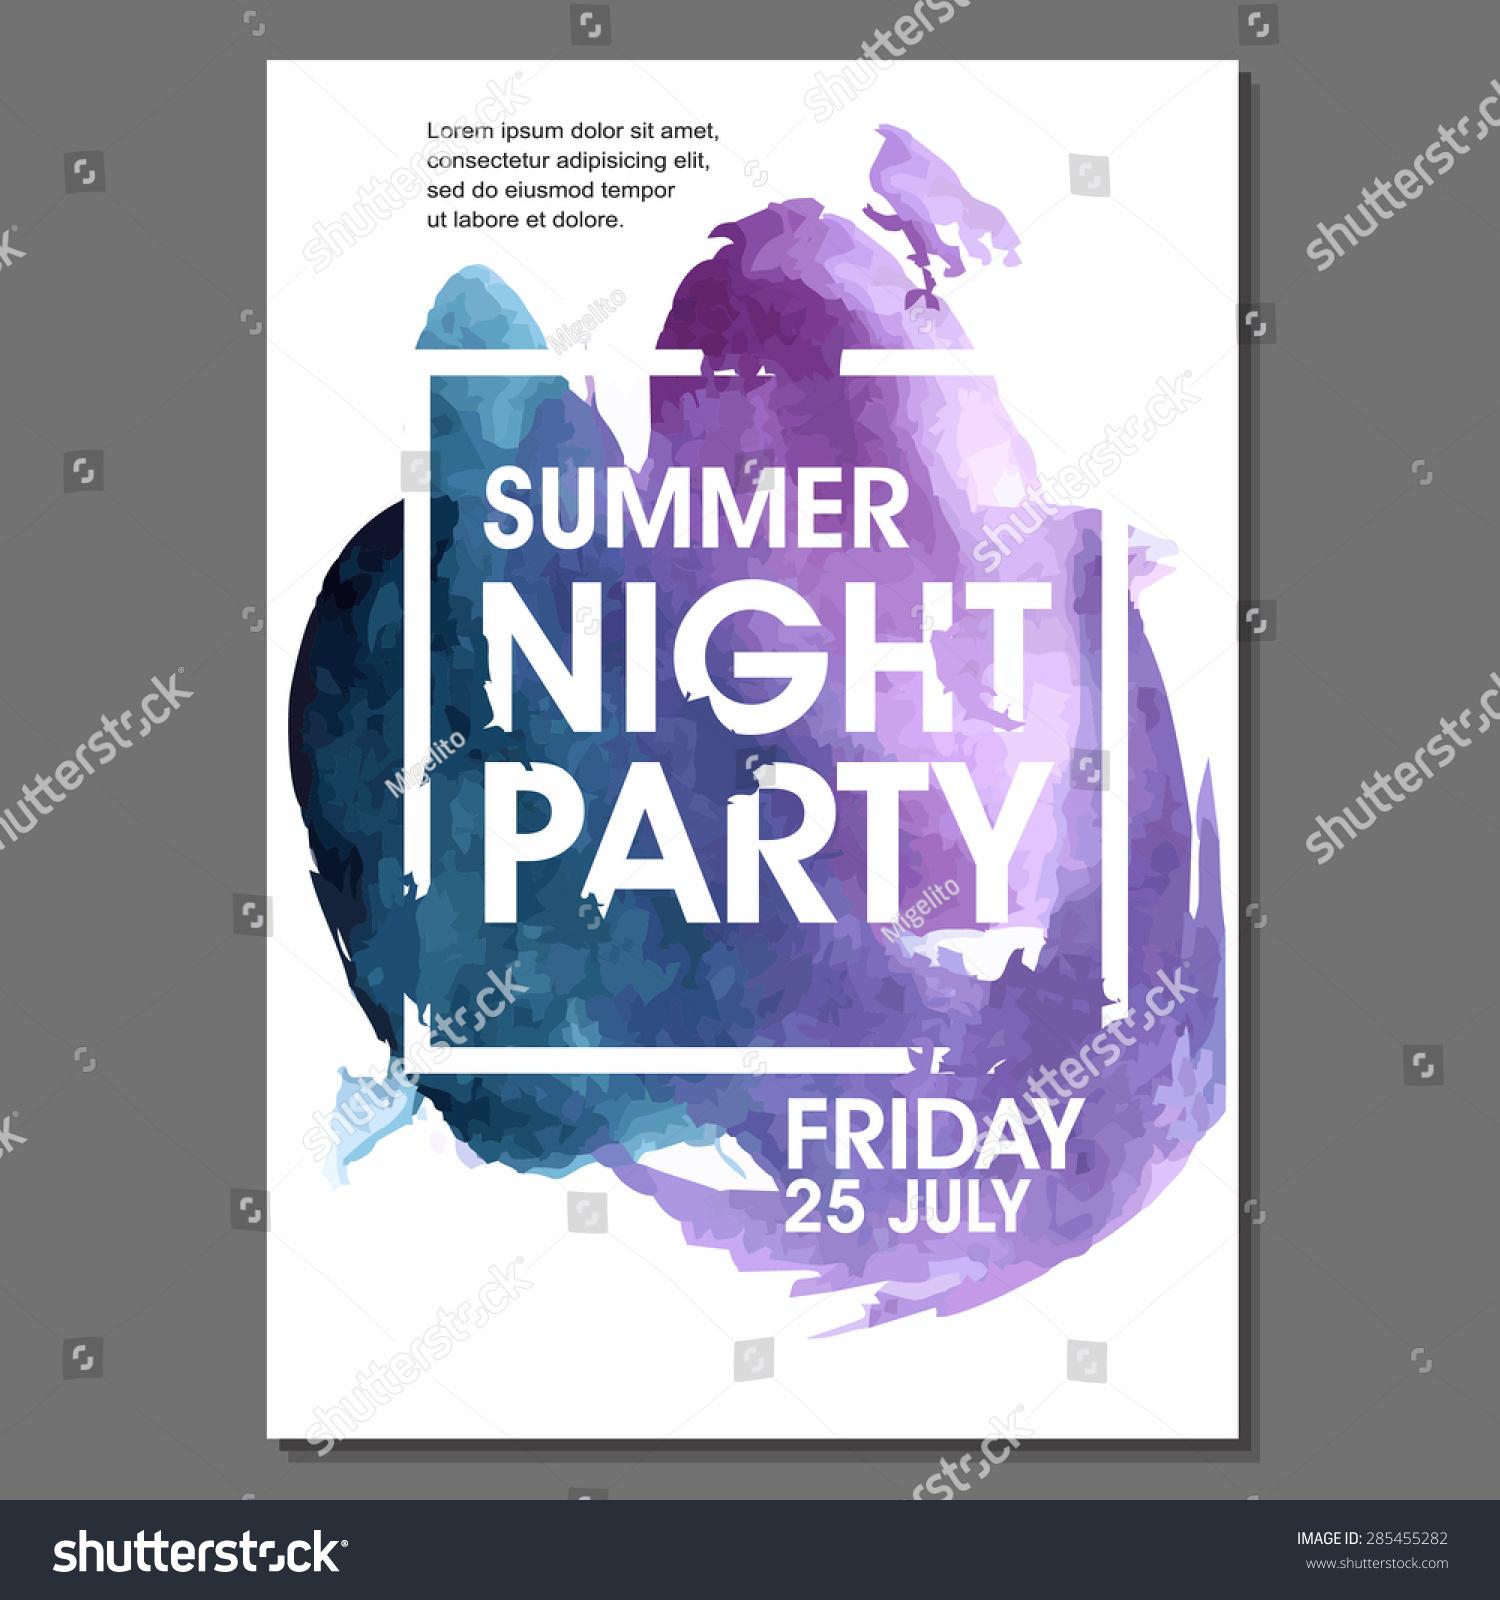 Night Party Vector Flyer Template Eps10 Stock Vector